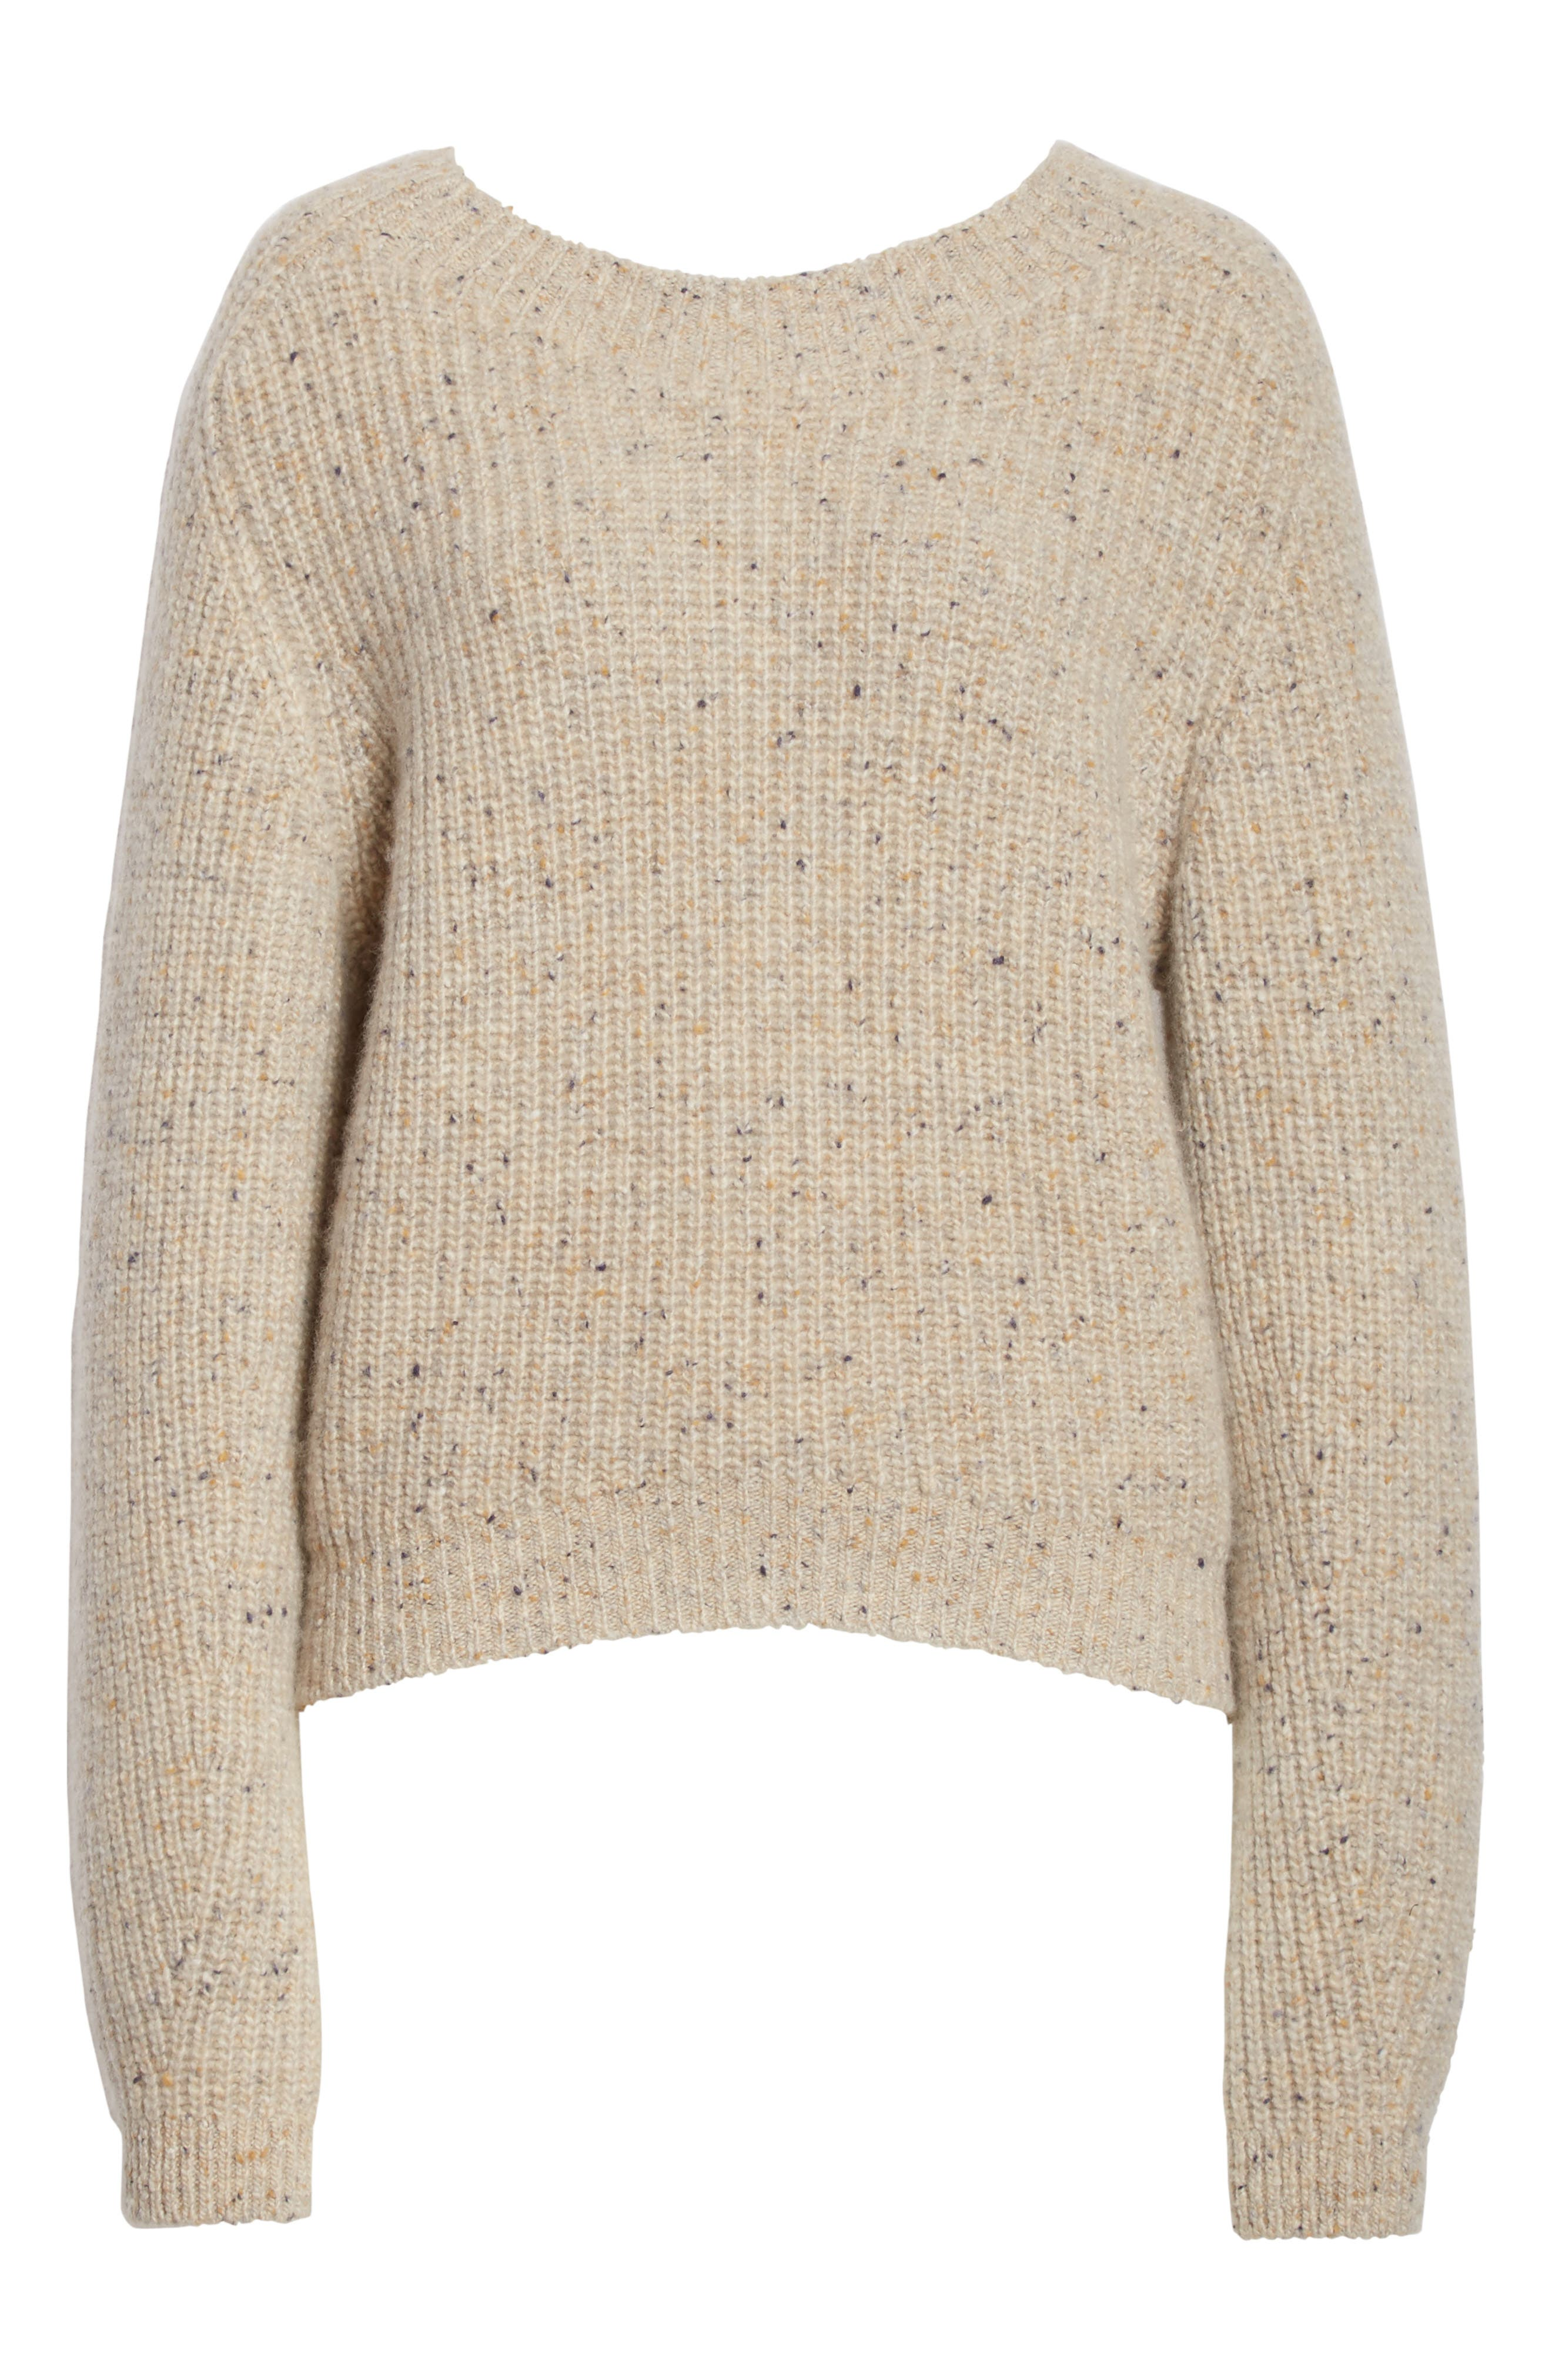 Saddle Sleeve Cashmere Sweater,                             Alternate thumbnail 6, color,                             Light Cream